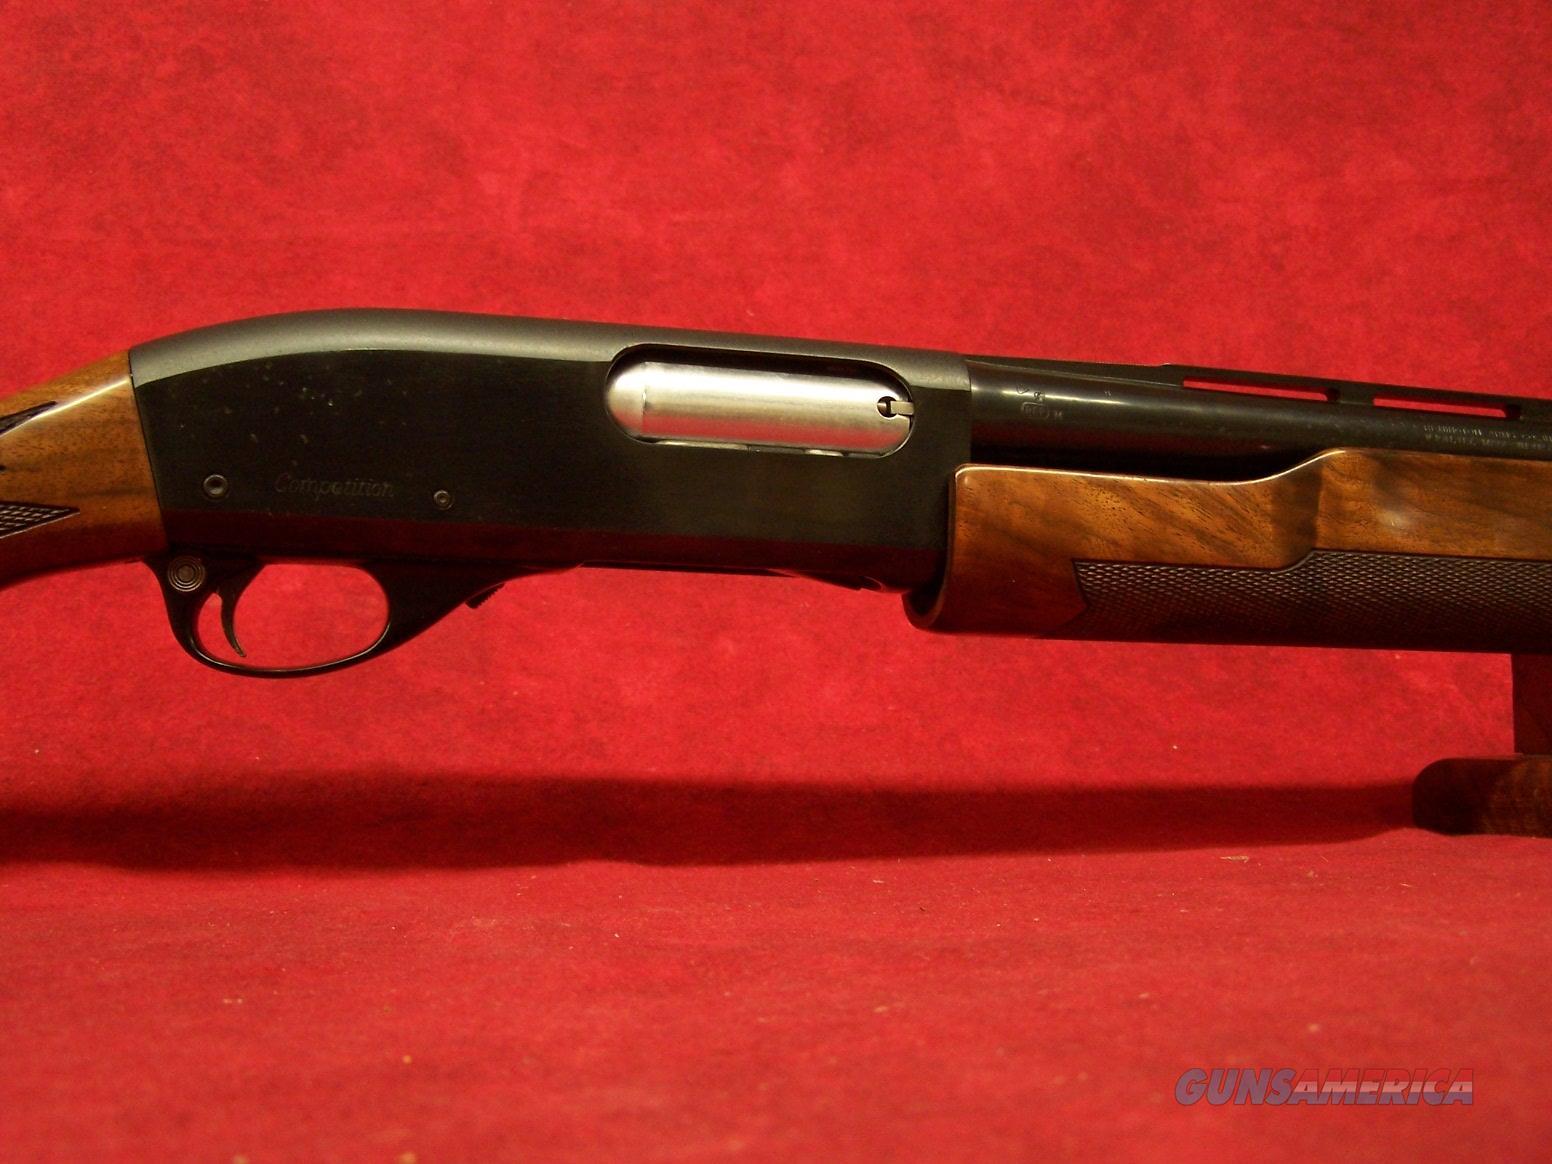 "Remington 870 Competition 12ga 30"" Full Barrel 2 3/4"" single shot  Guns > Shotguns > Remington Shotguns  > Pump > Hunting"